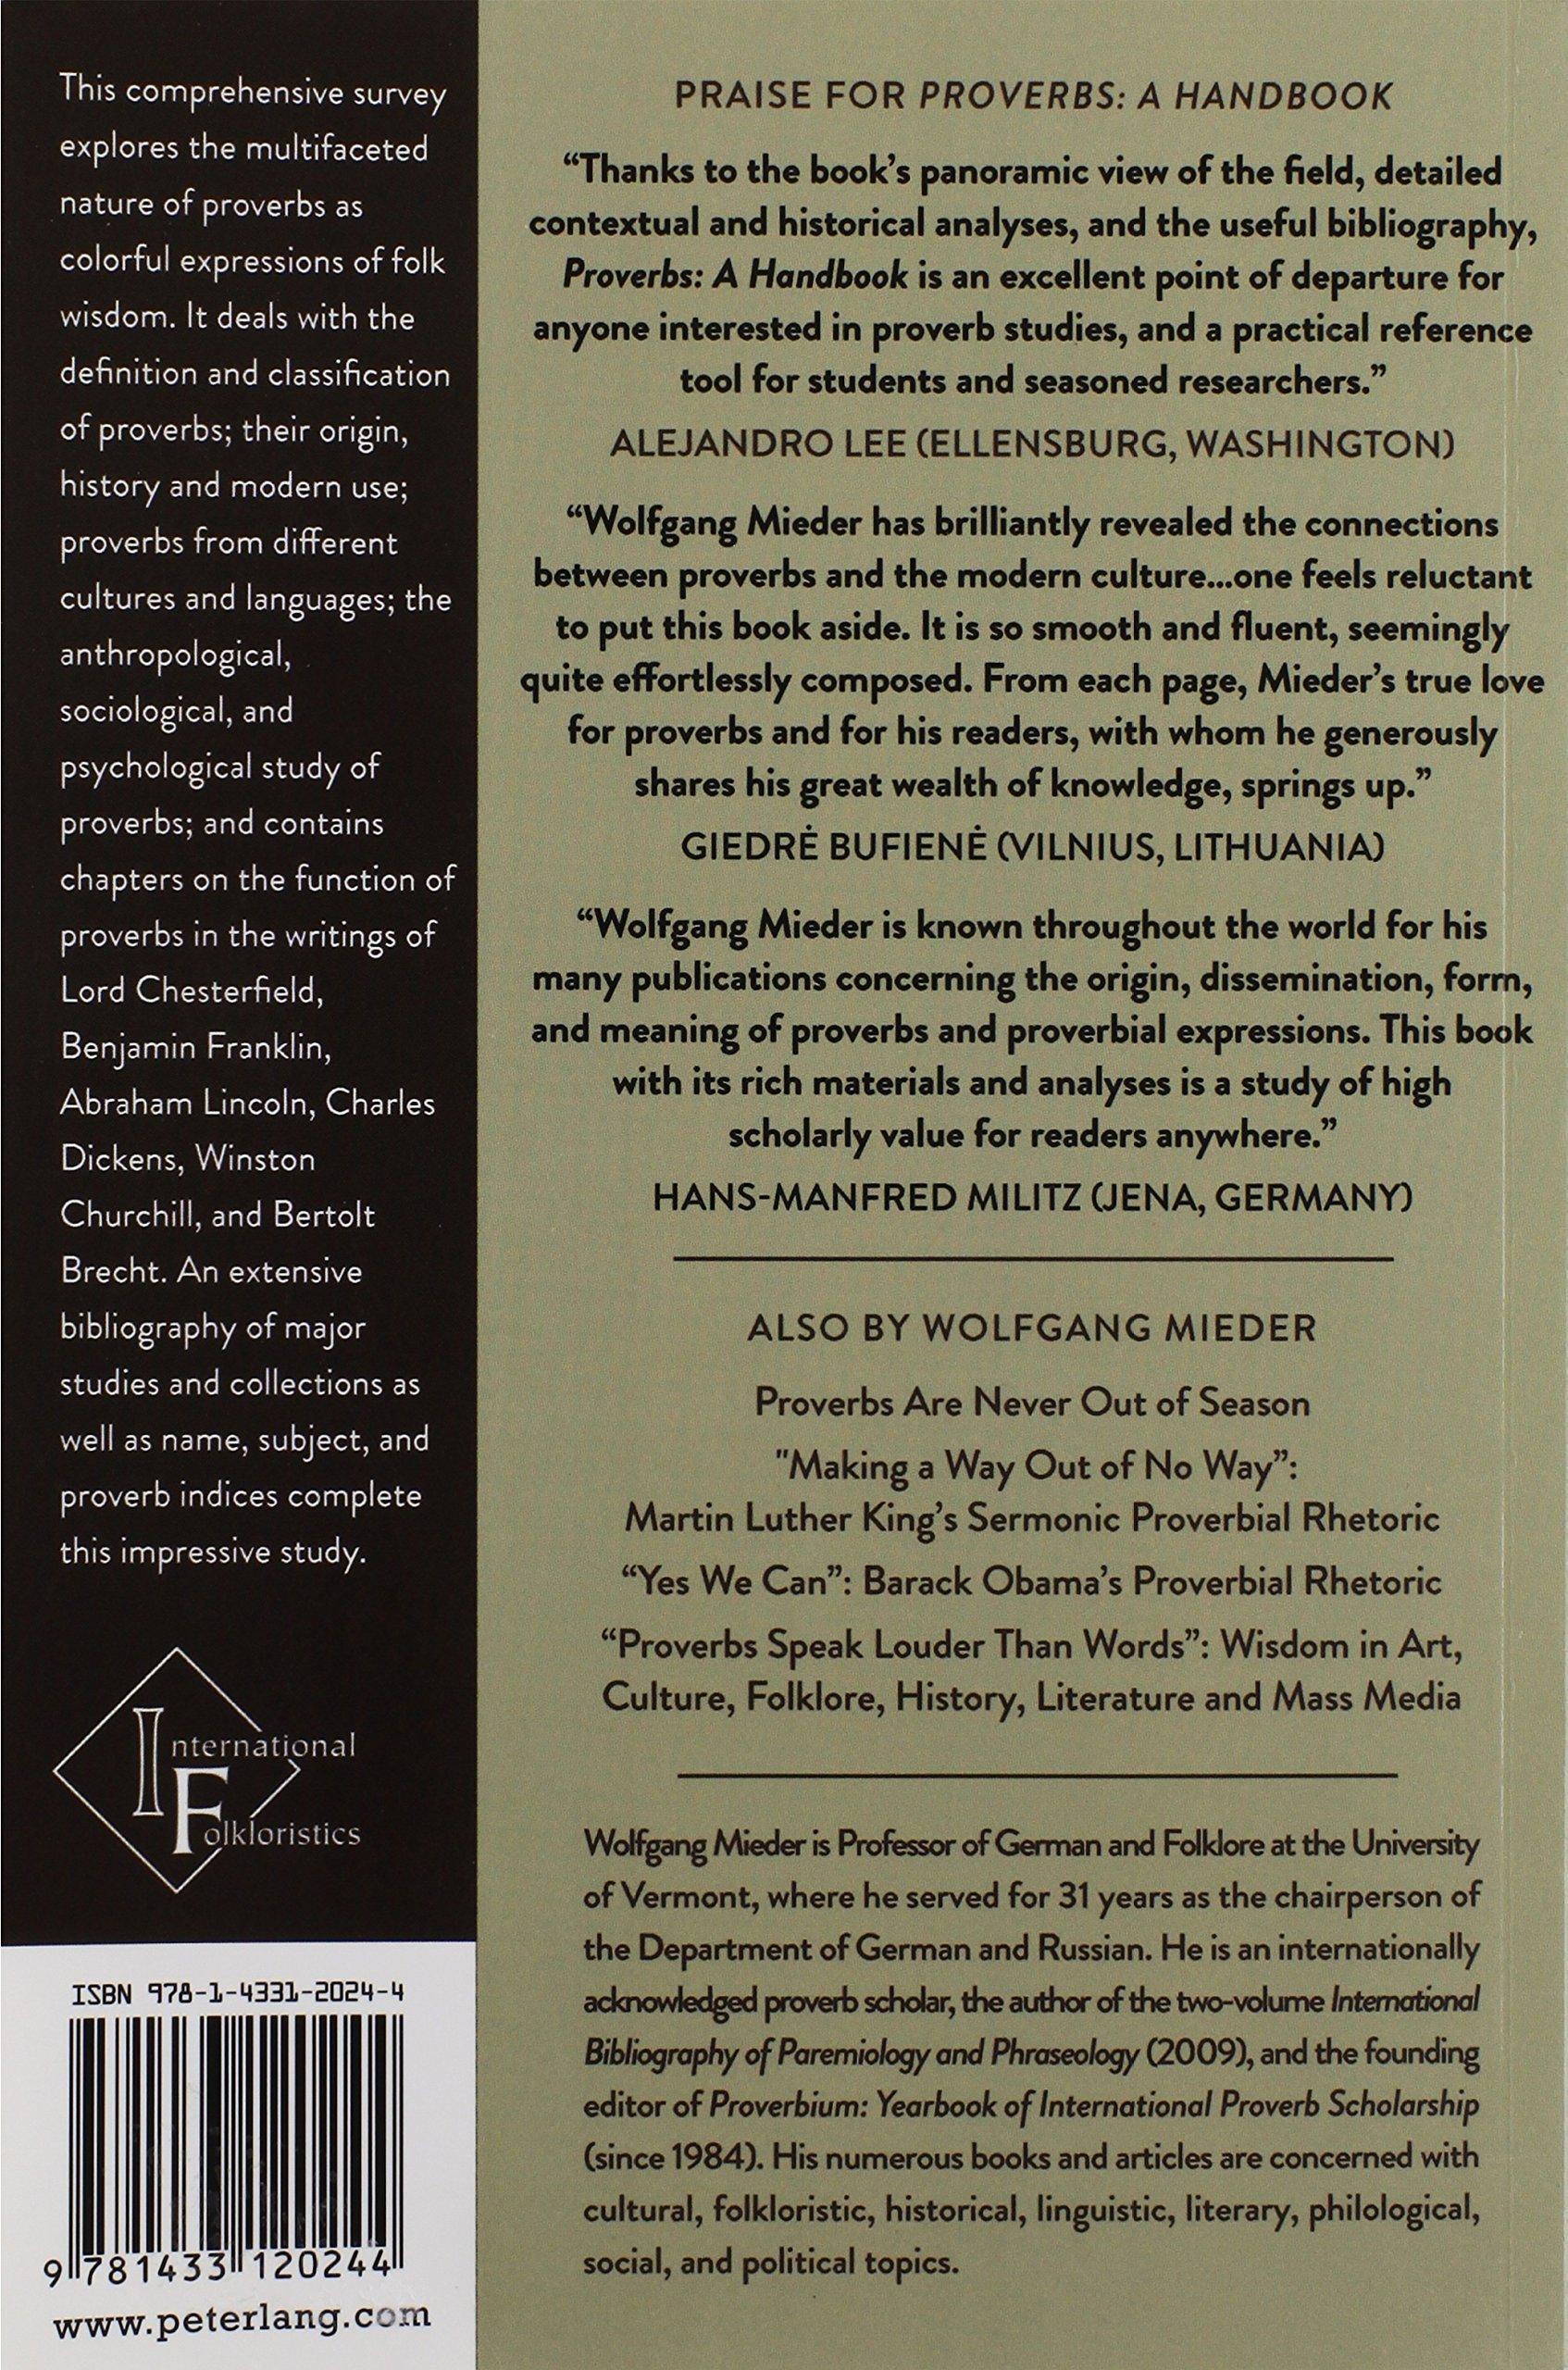 Proverbs: A Handbook (International Folkloristics)